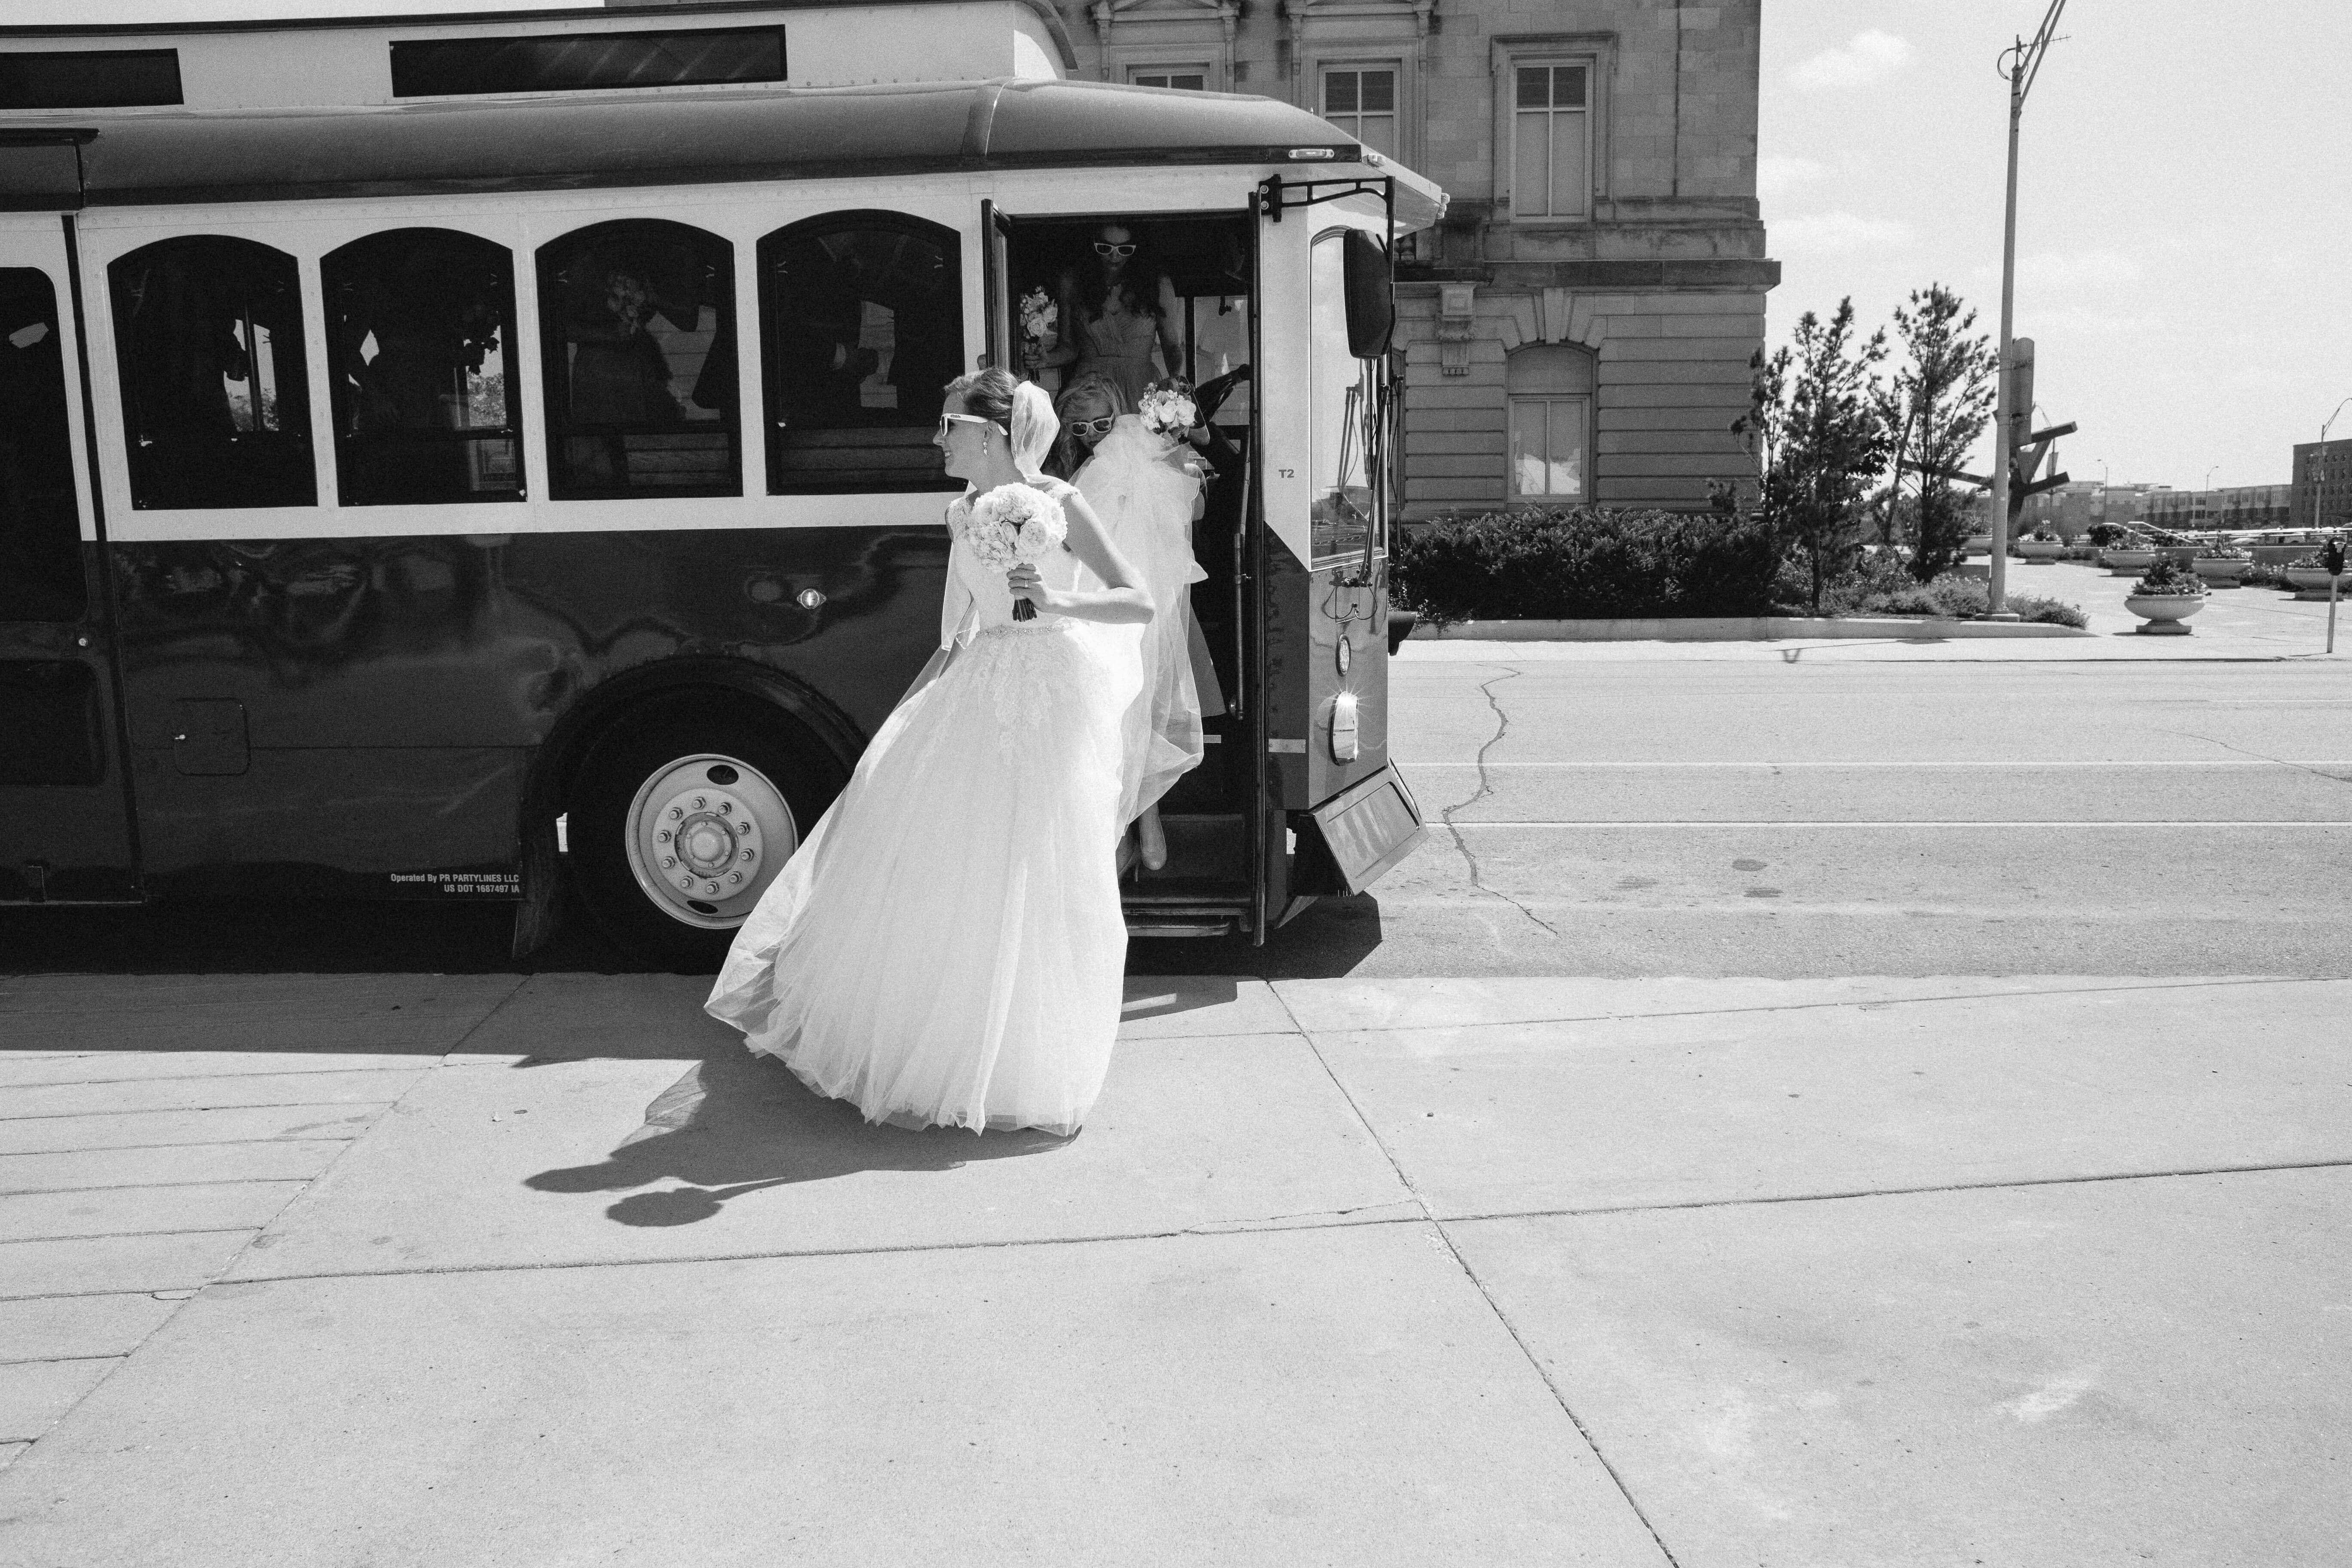 maahs_wedding-287-(ZF-5929-93784-1-016)